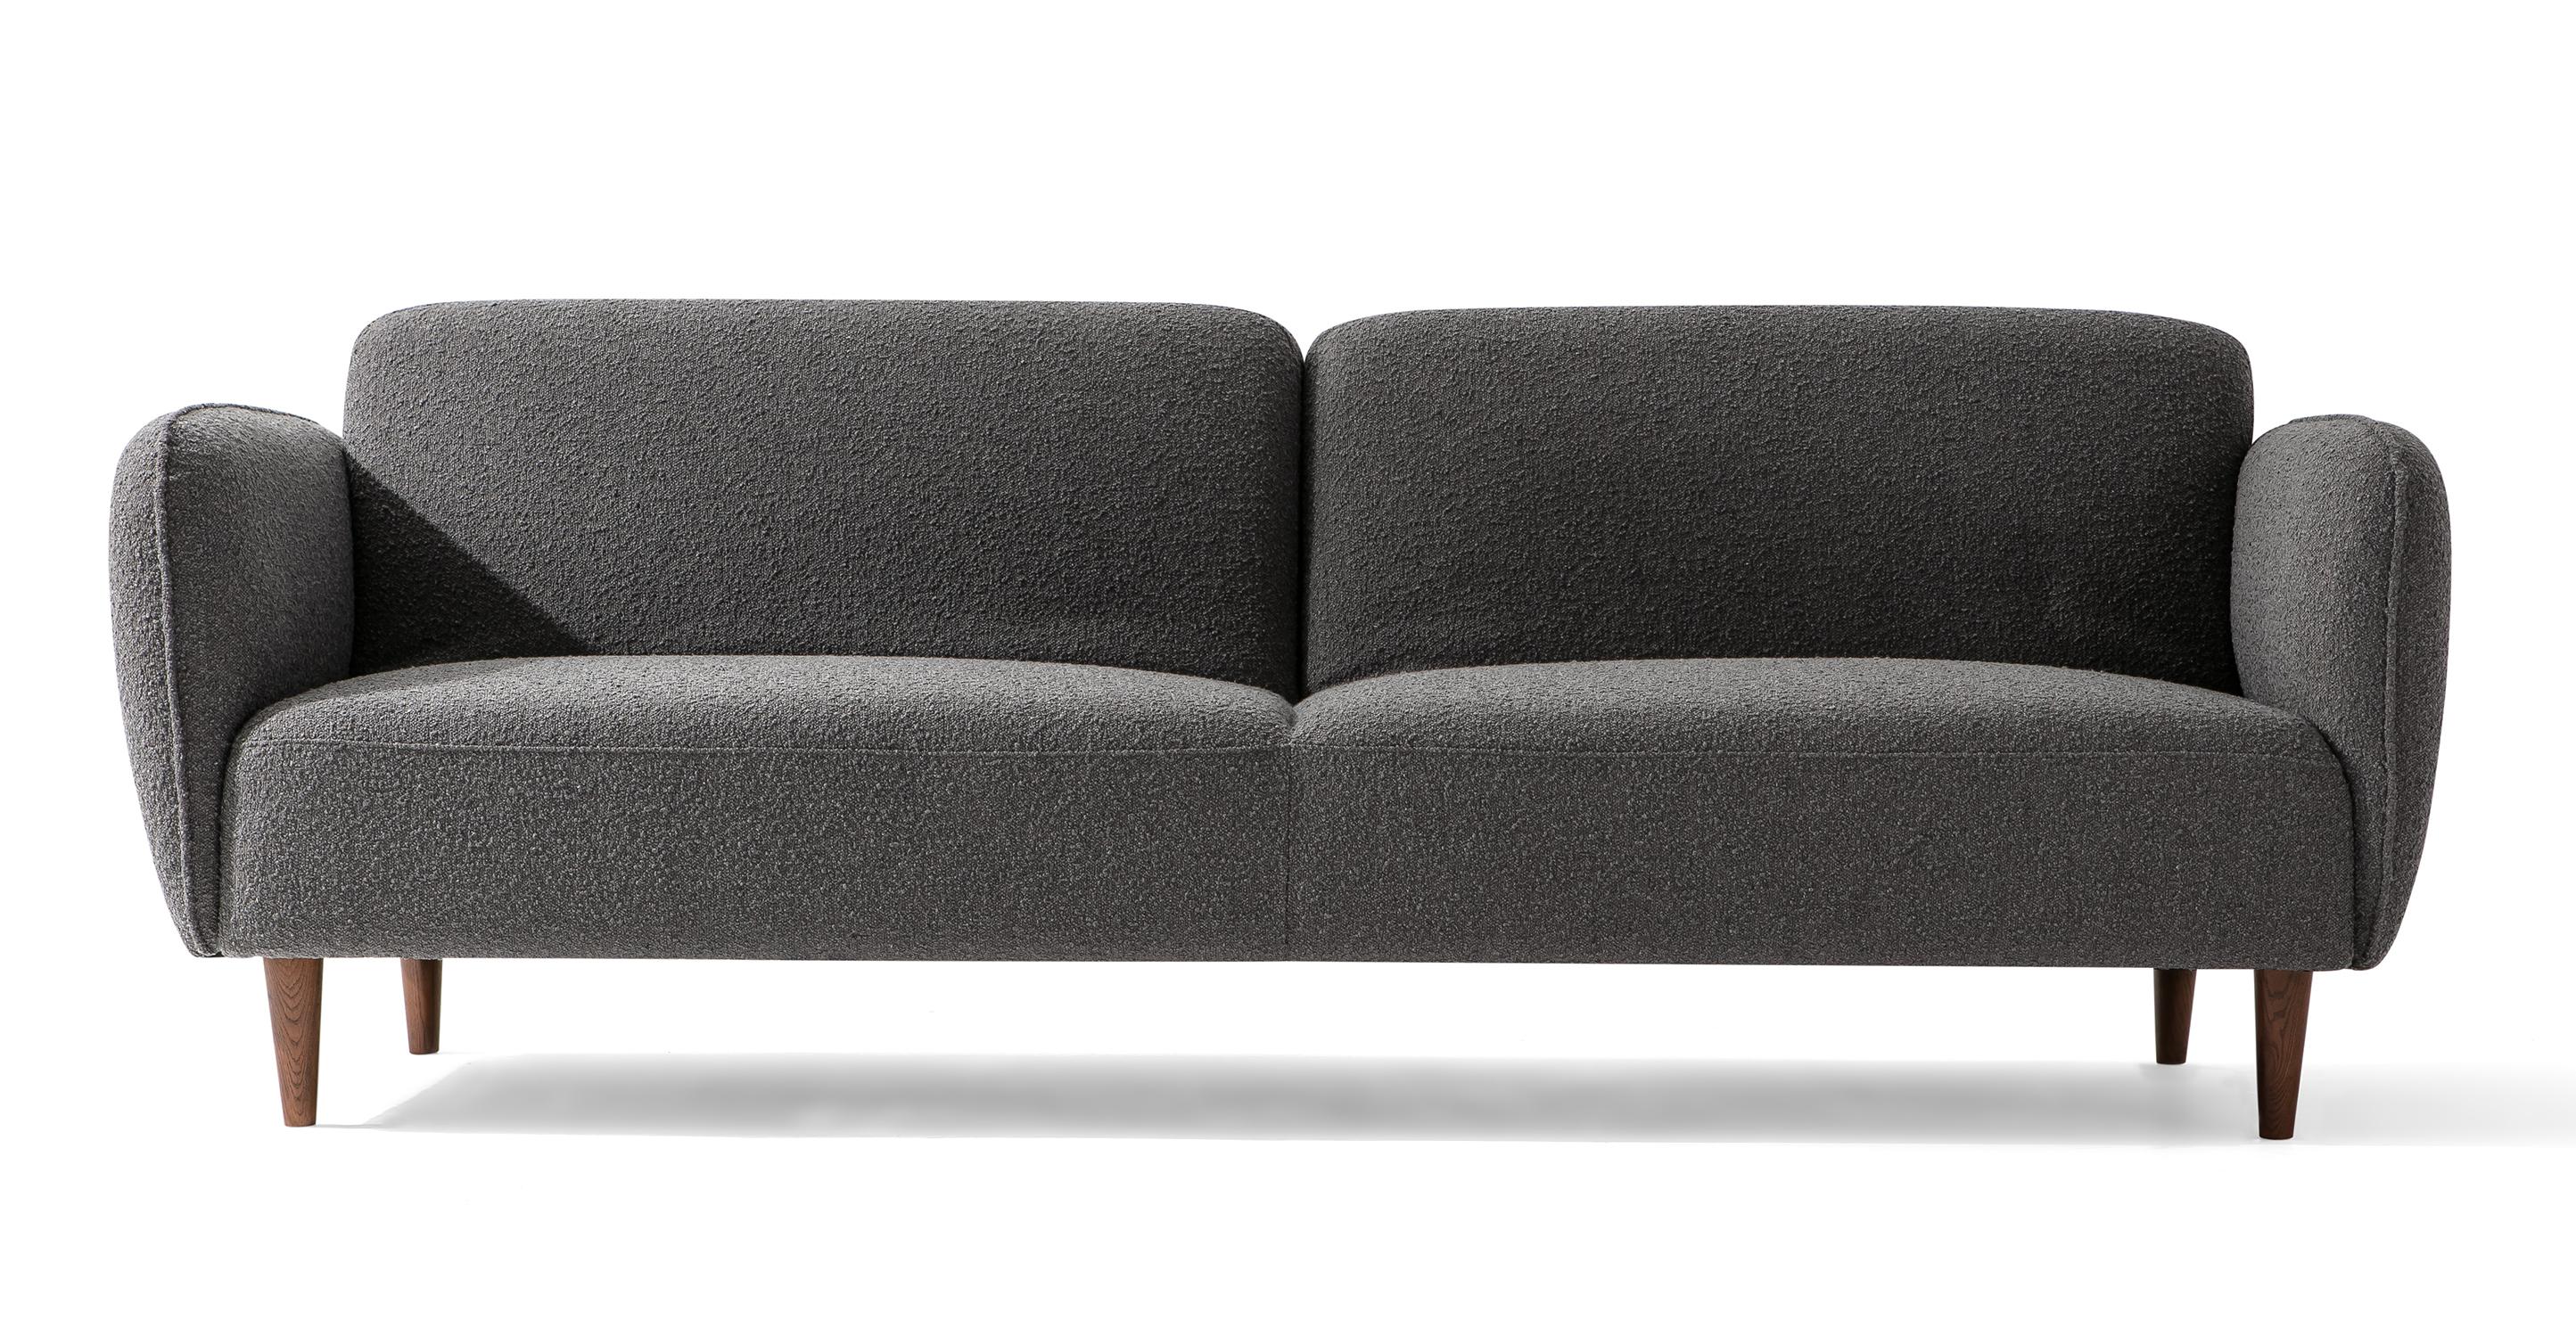 "Omer 88"" Fabric Sofa Sleeper, Gris Boucle"